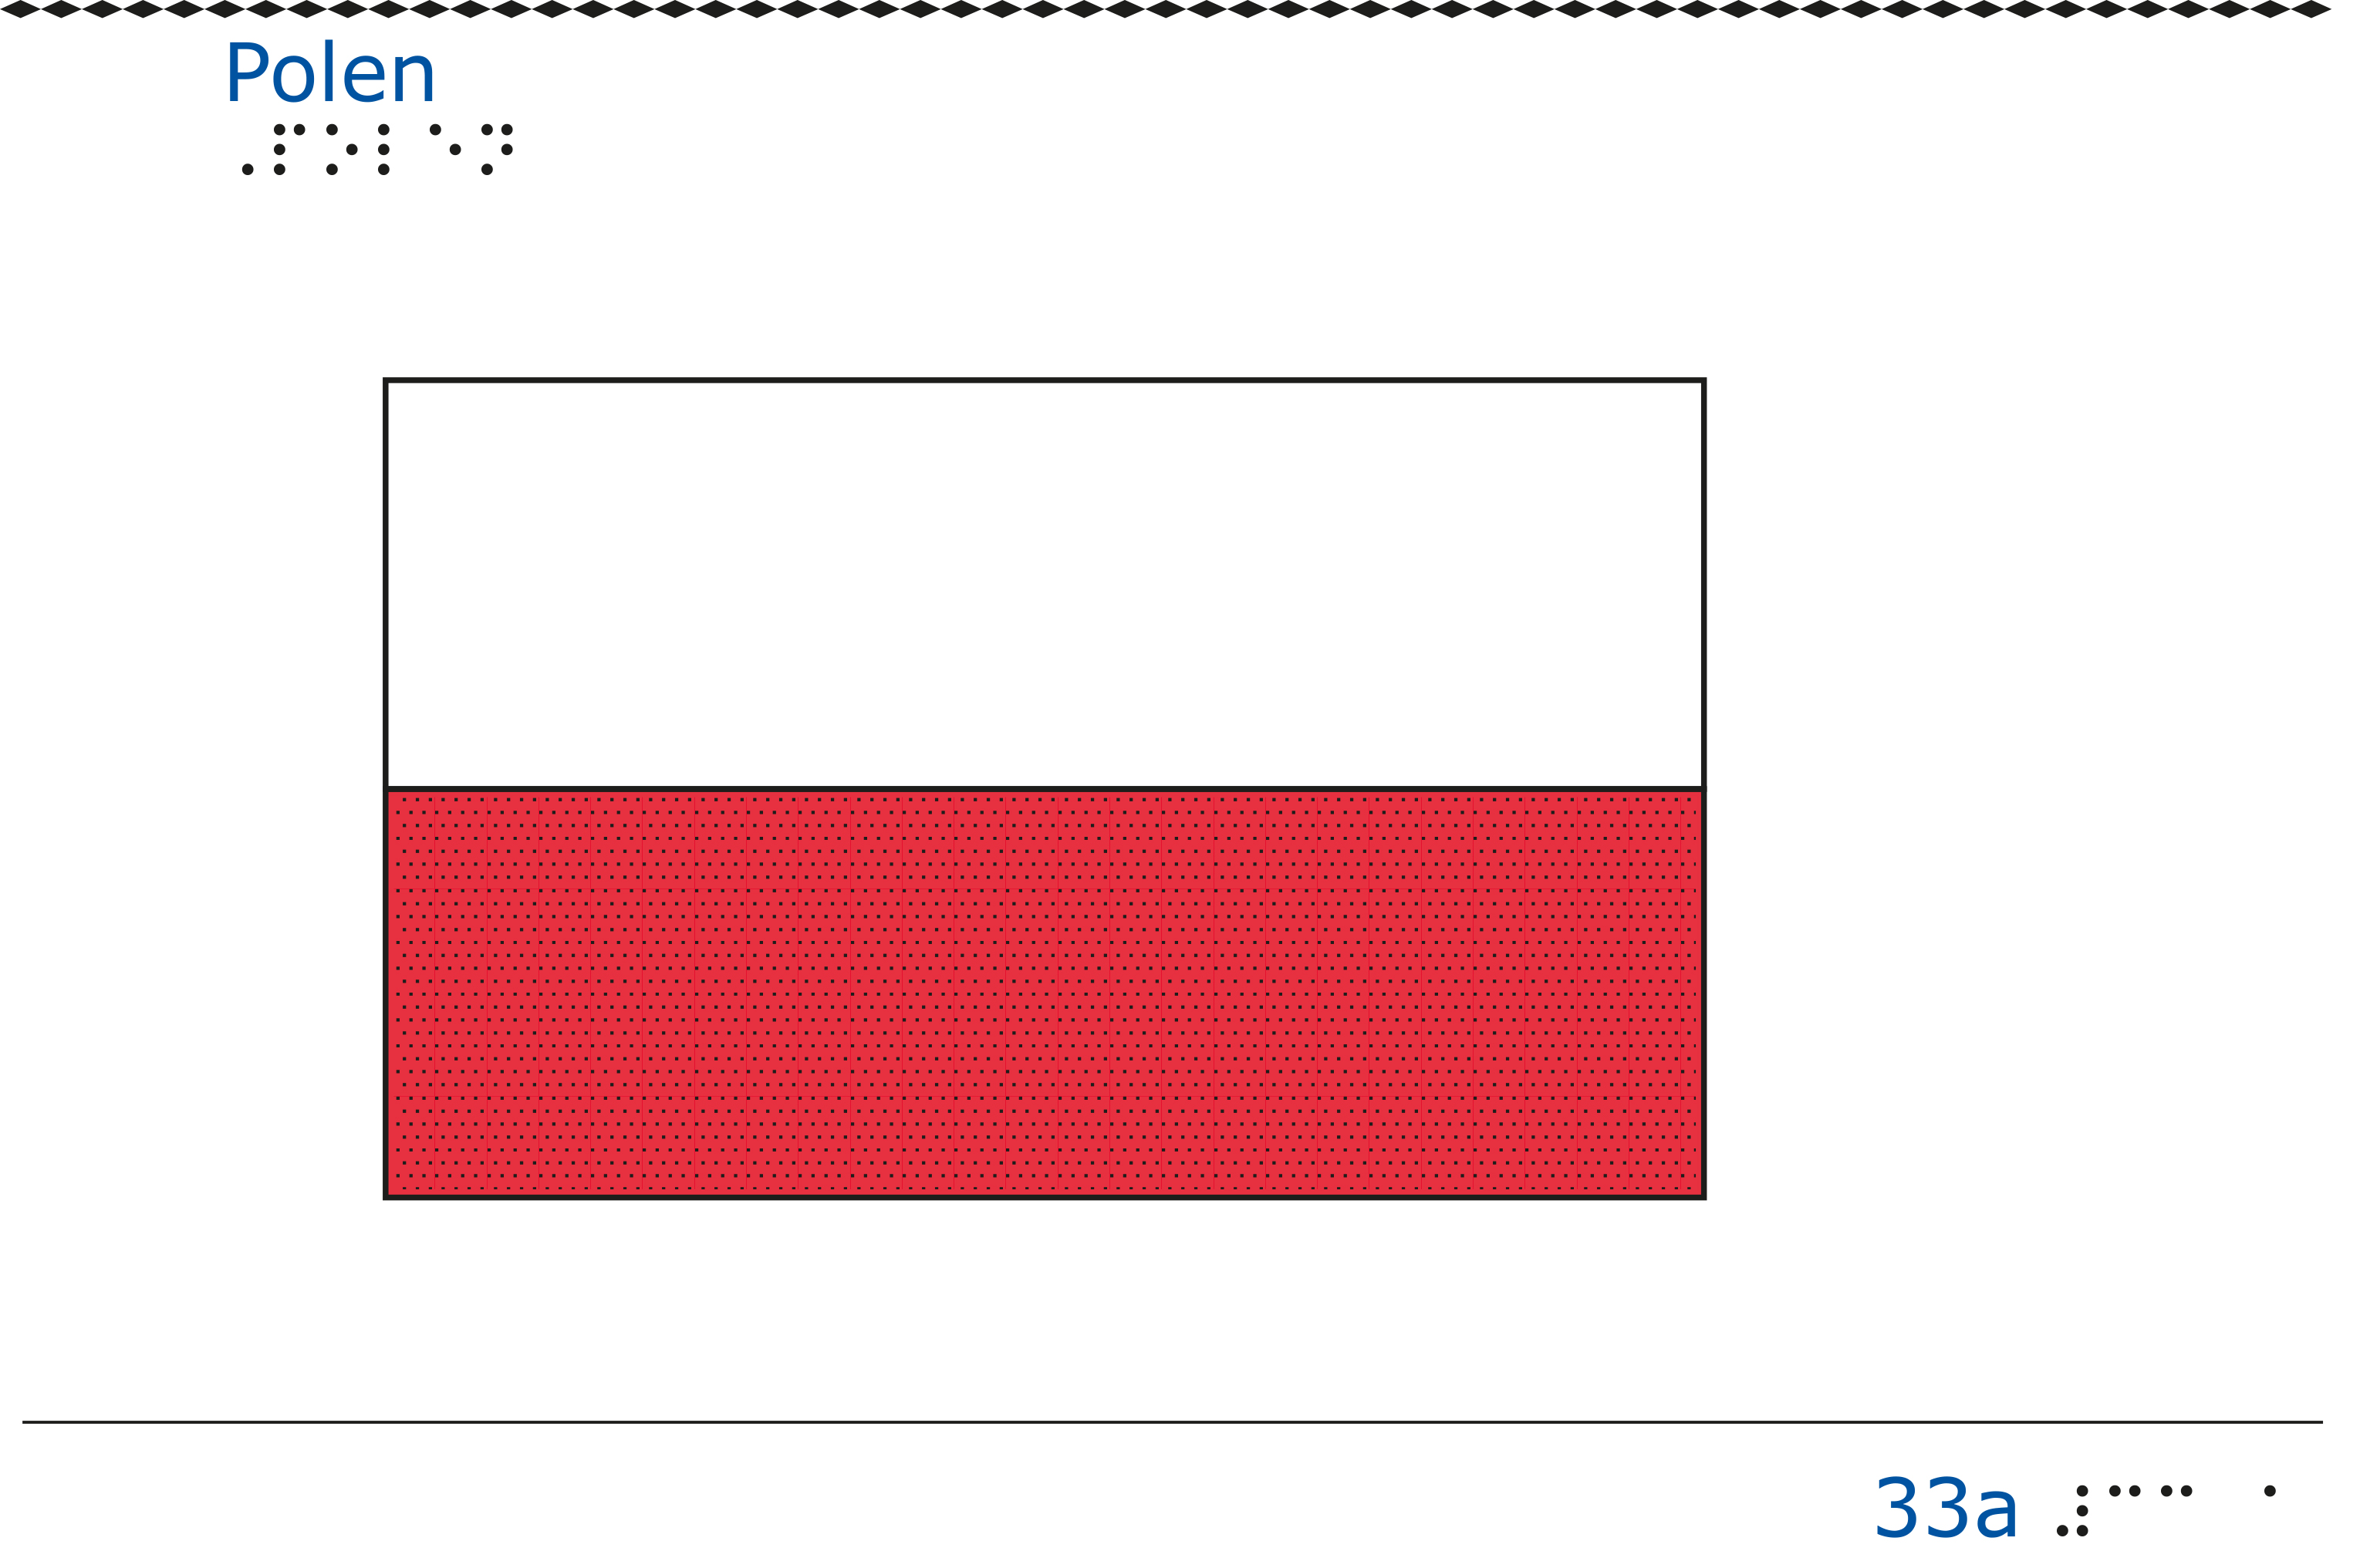 Taktil bild - Polens flagga.